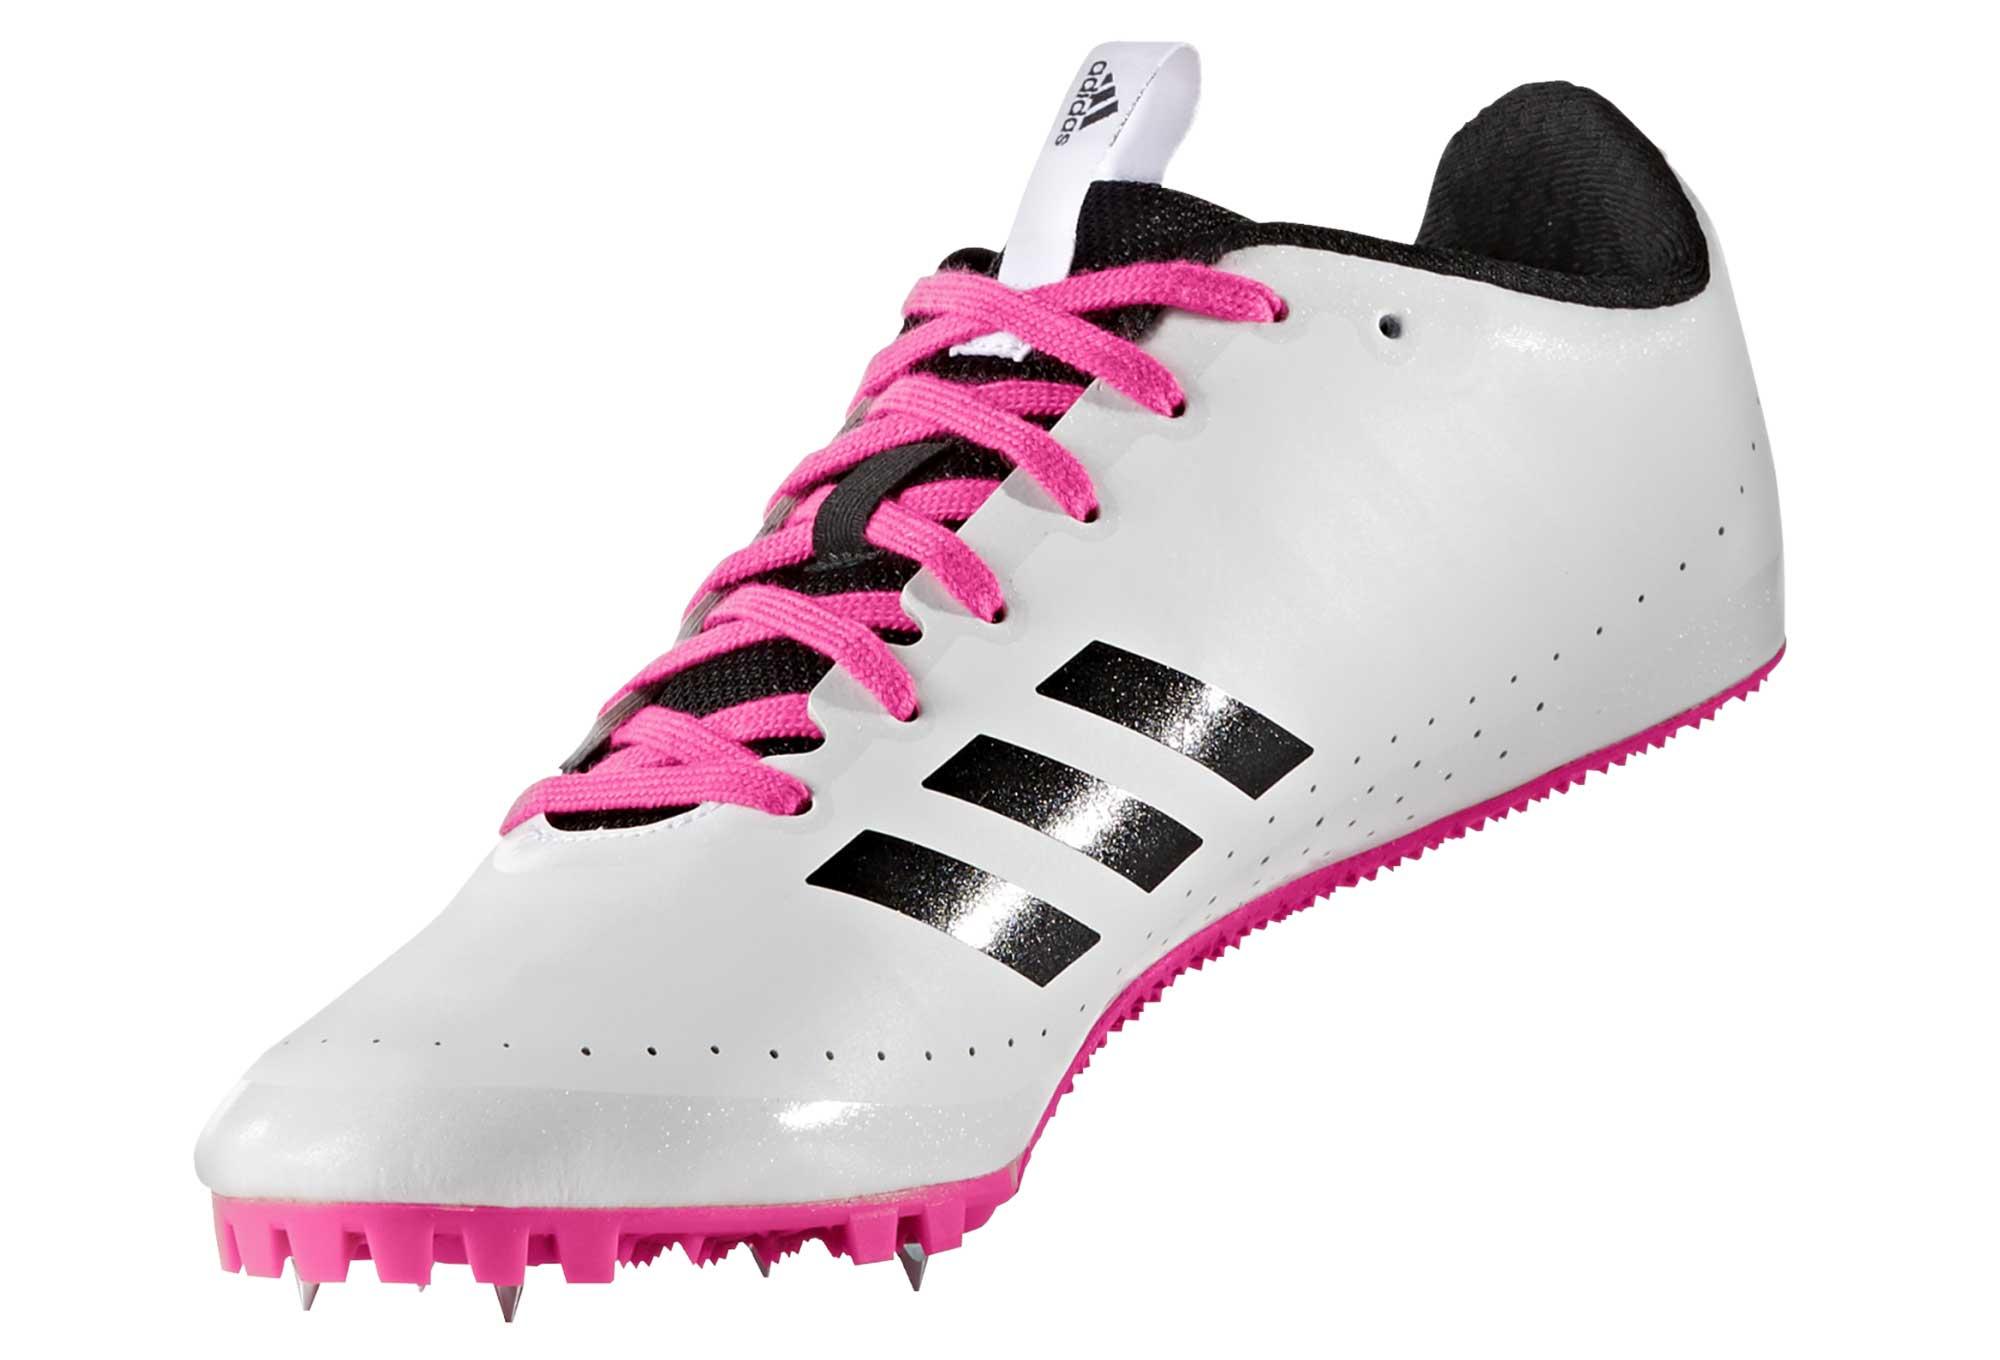 new arrival 01633 276c1 Chaussures dAthlétisme Femme adidas running Sprintstar Blanc  Rose